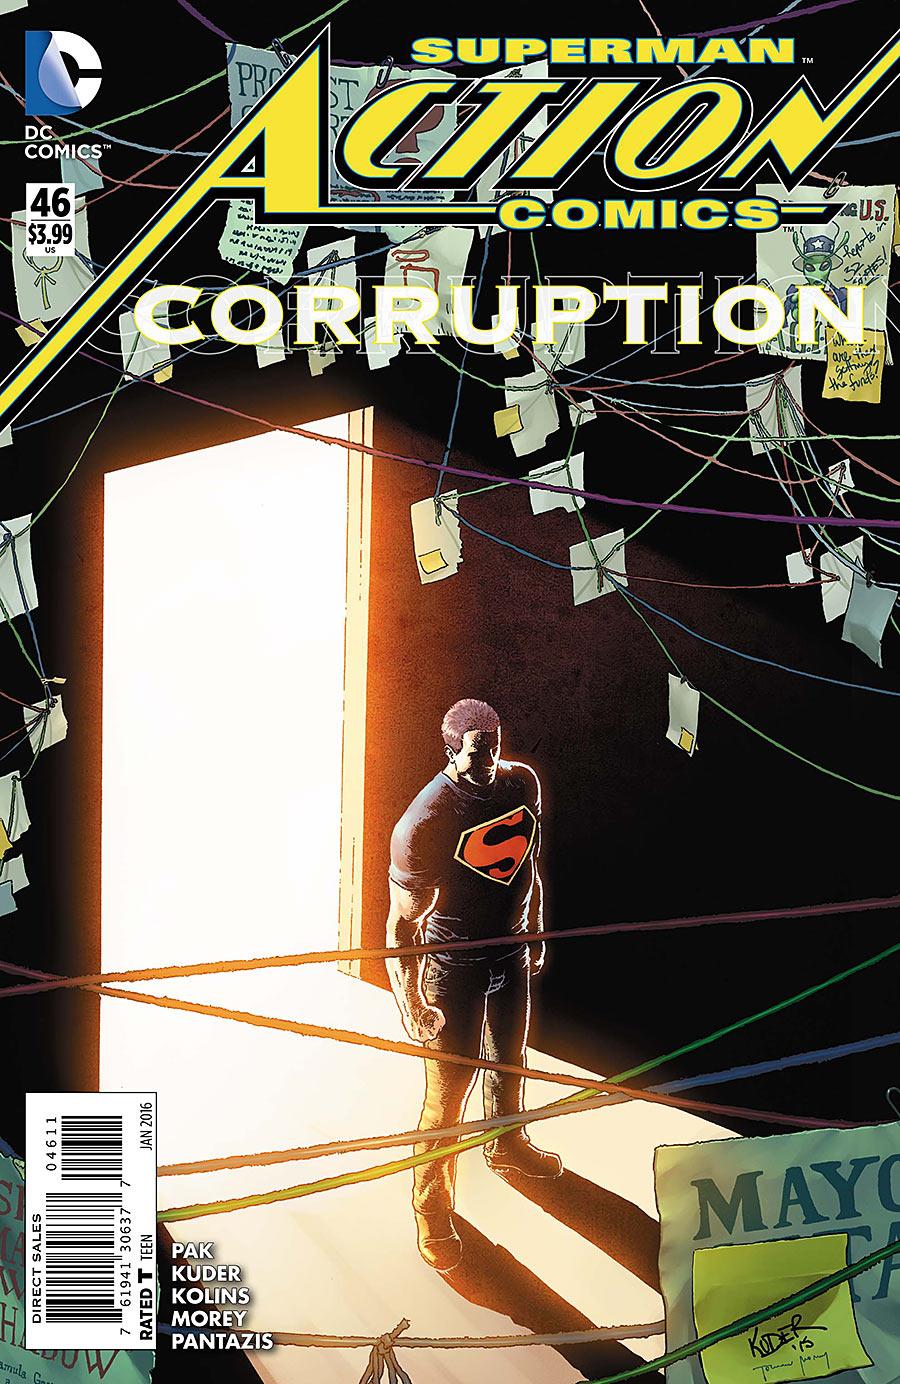 Action Comics #46